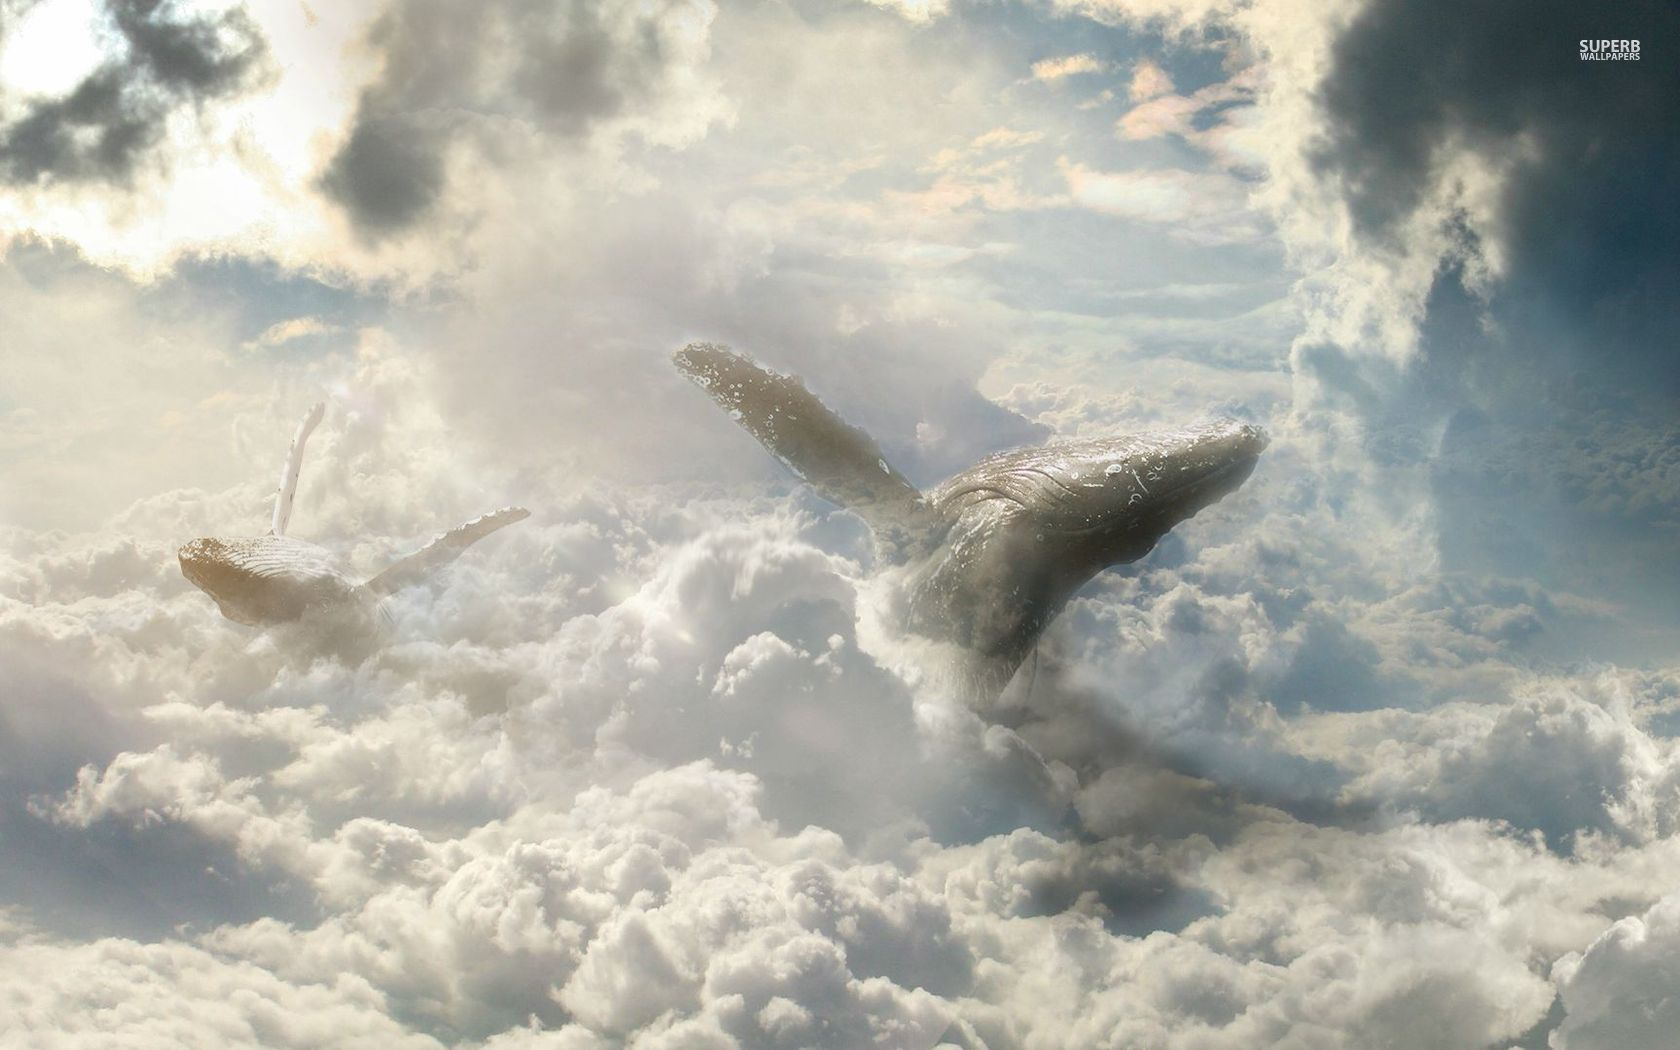 Flying Whale Wallpaper Google Search Whale Fantasy Art Art